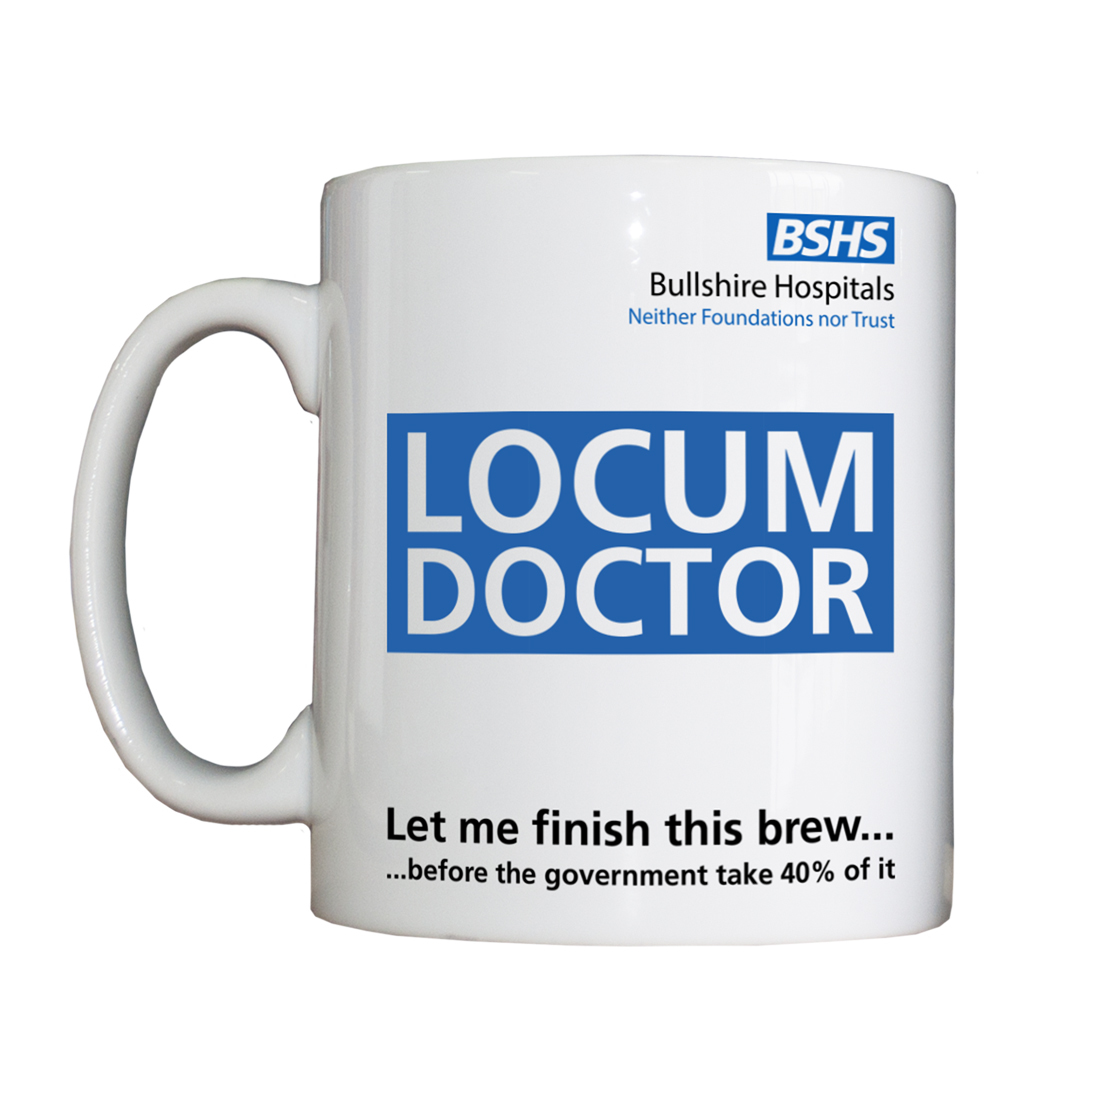 Personalised 'Locum Doctor' Drinking Vessel LocumDoctorVessel